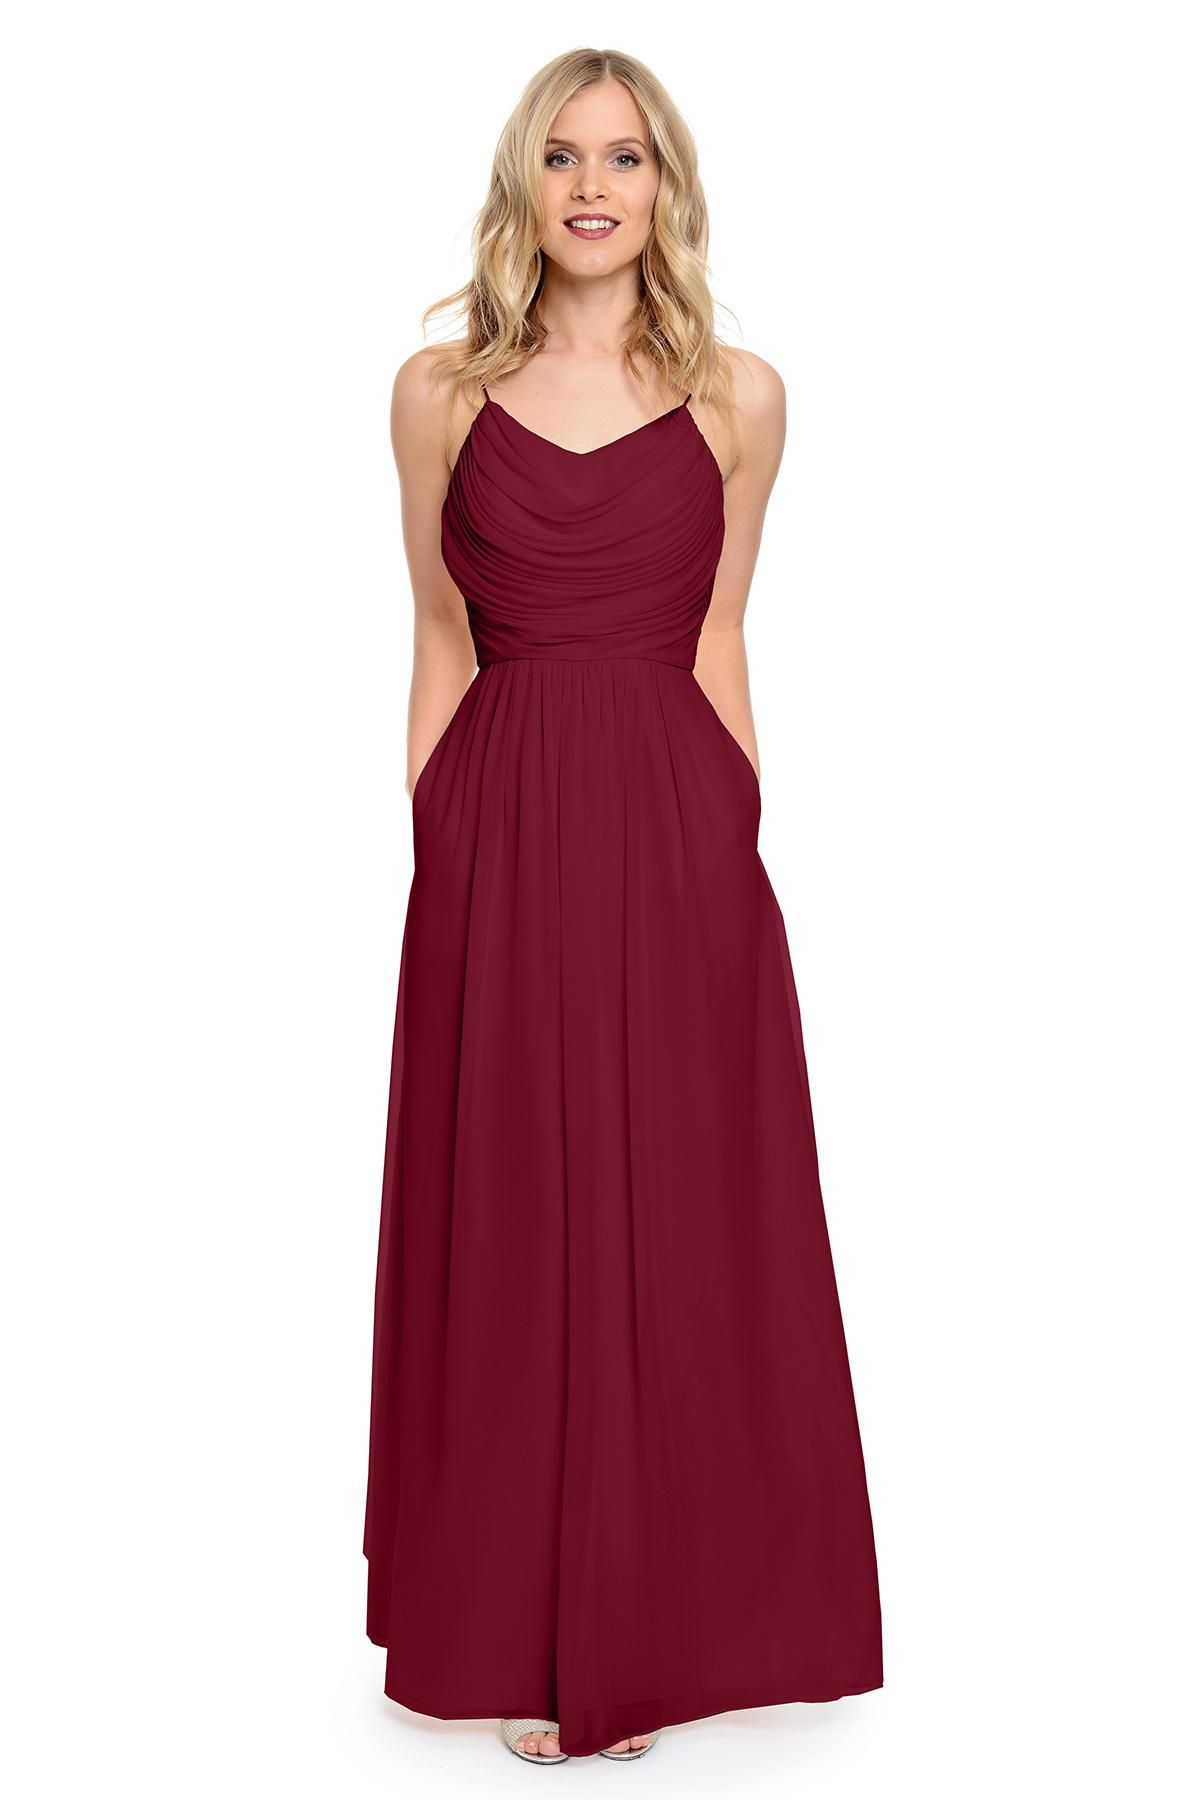 wineblueburgundy bridesmaid dresses long pleated wedding